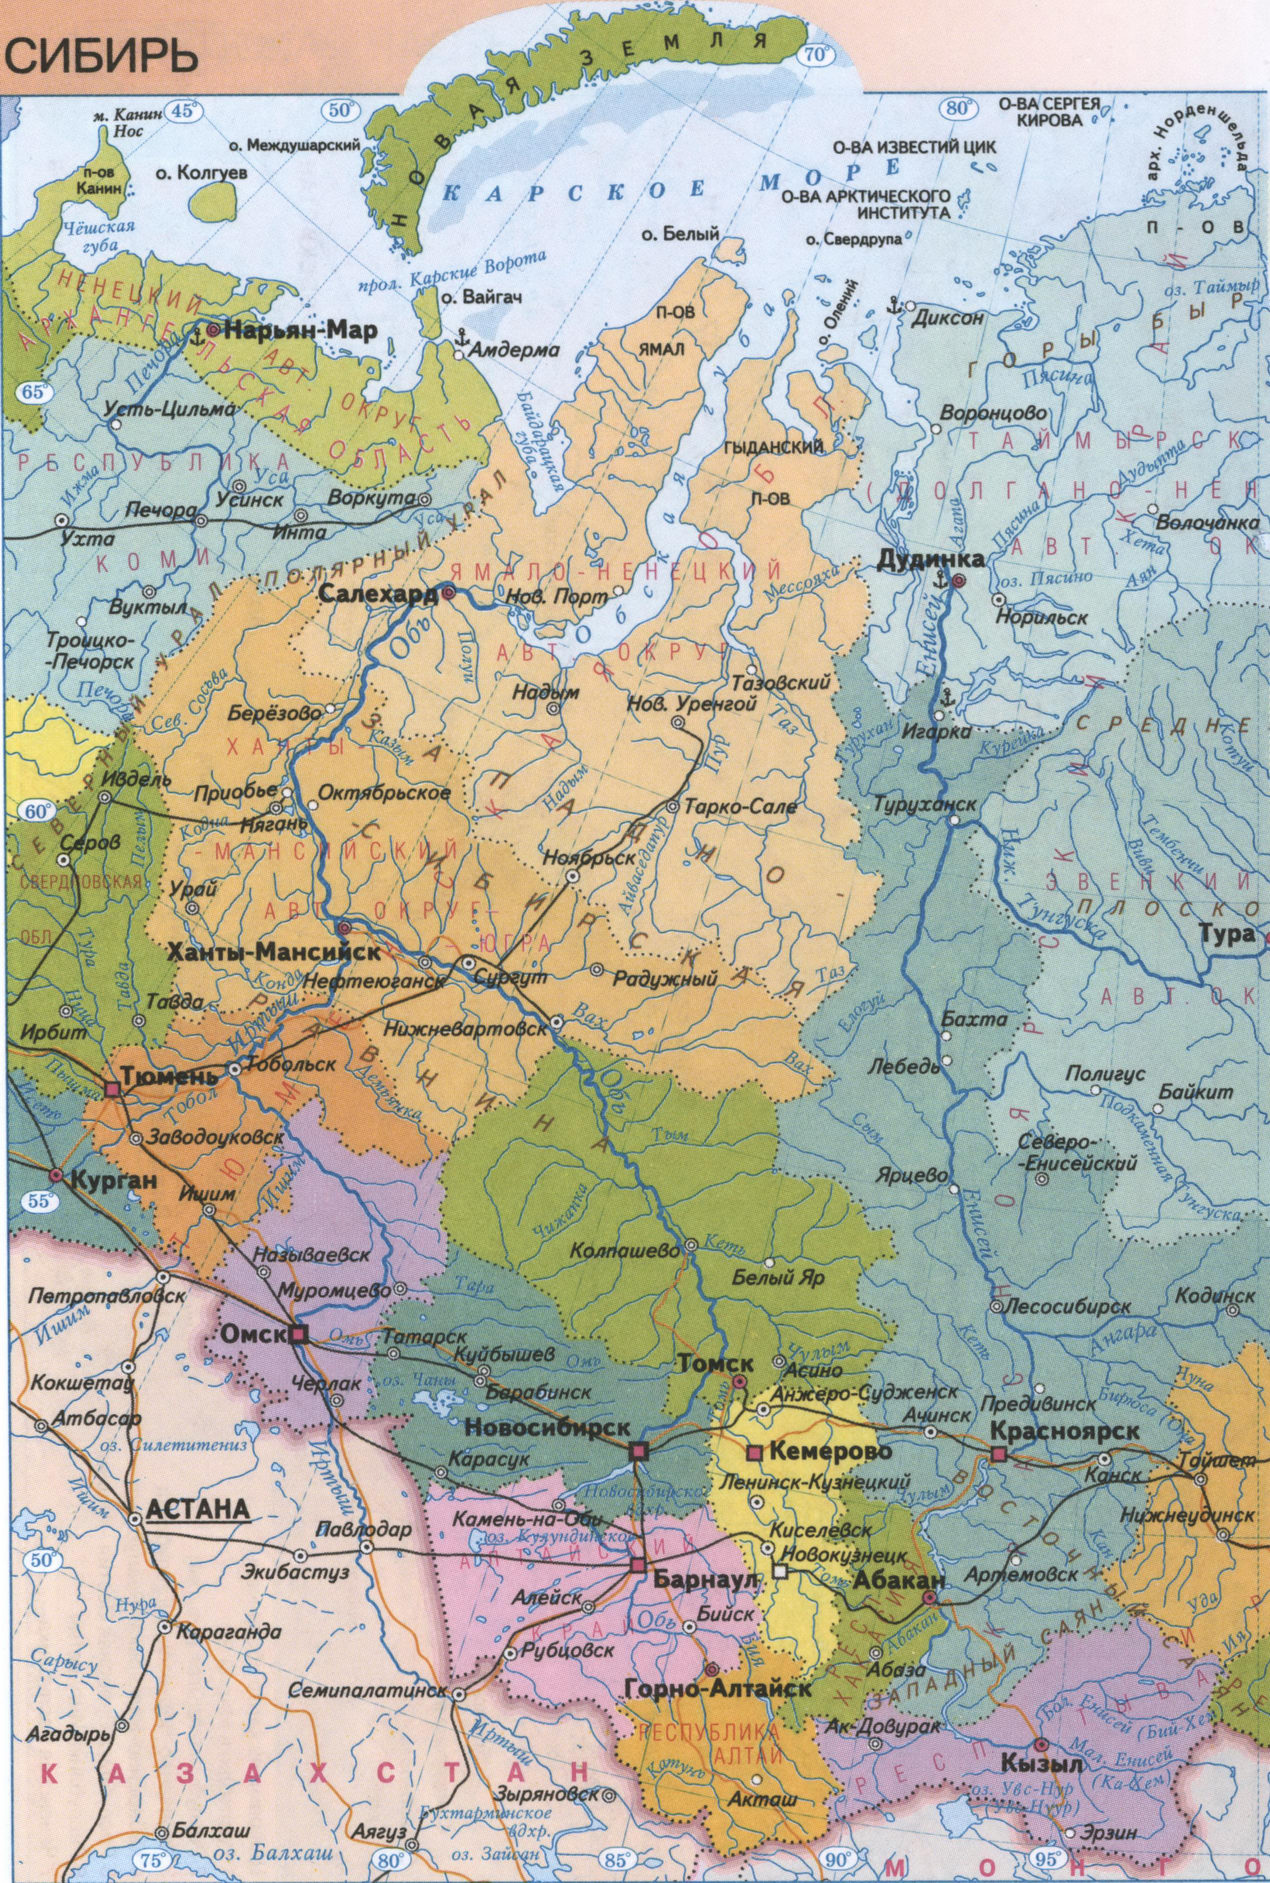 Sibir Karta Podrobnaya